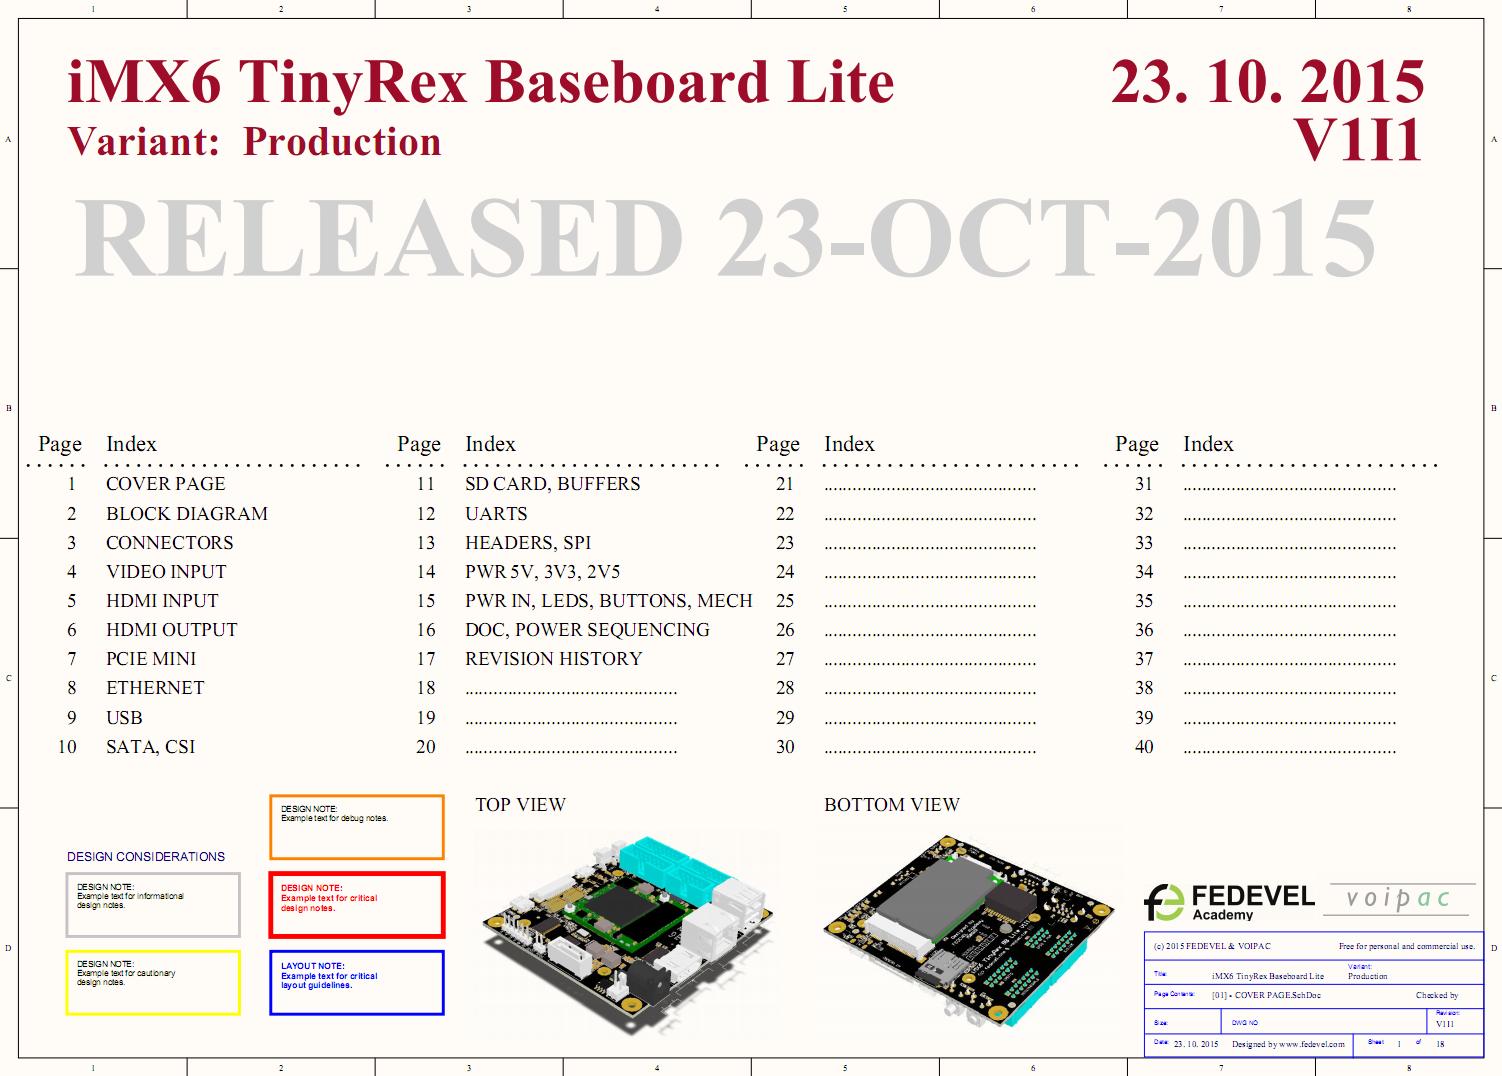 iMX6 TinyRex Baseboard Lite V1I1 - Schematic